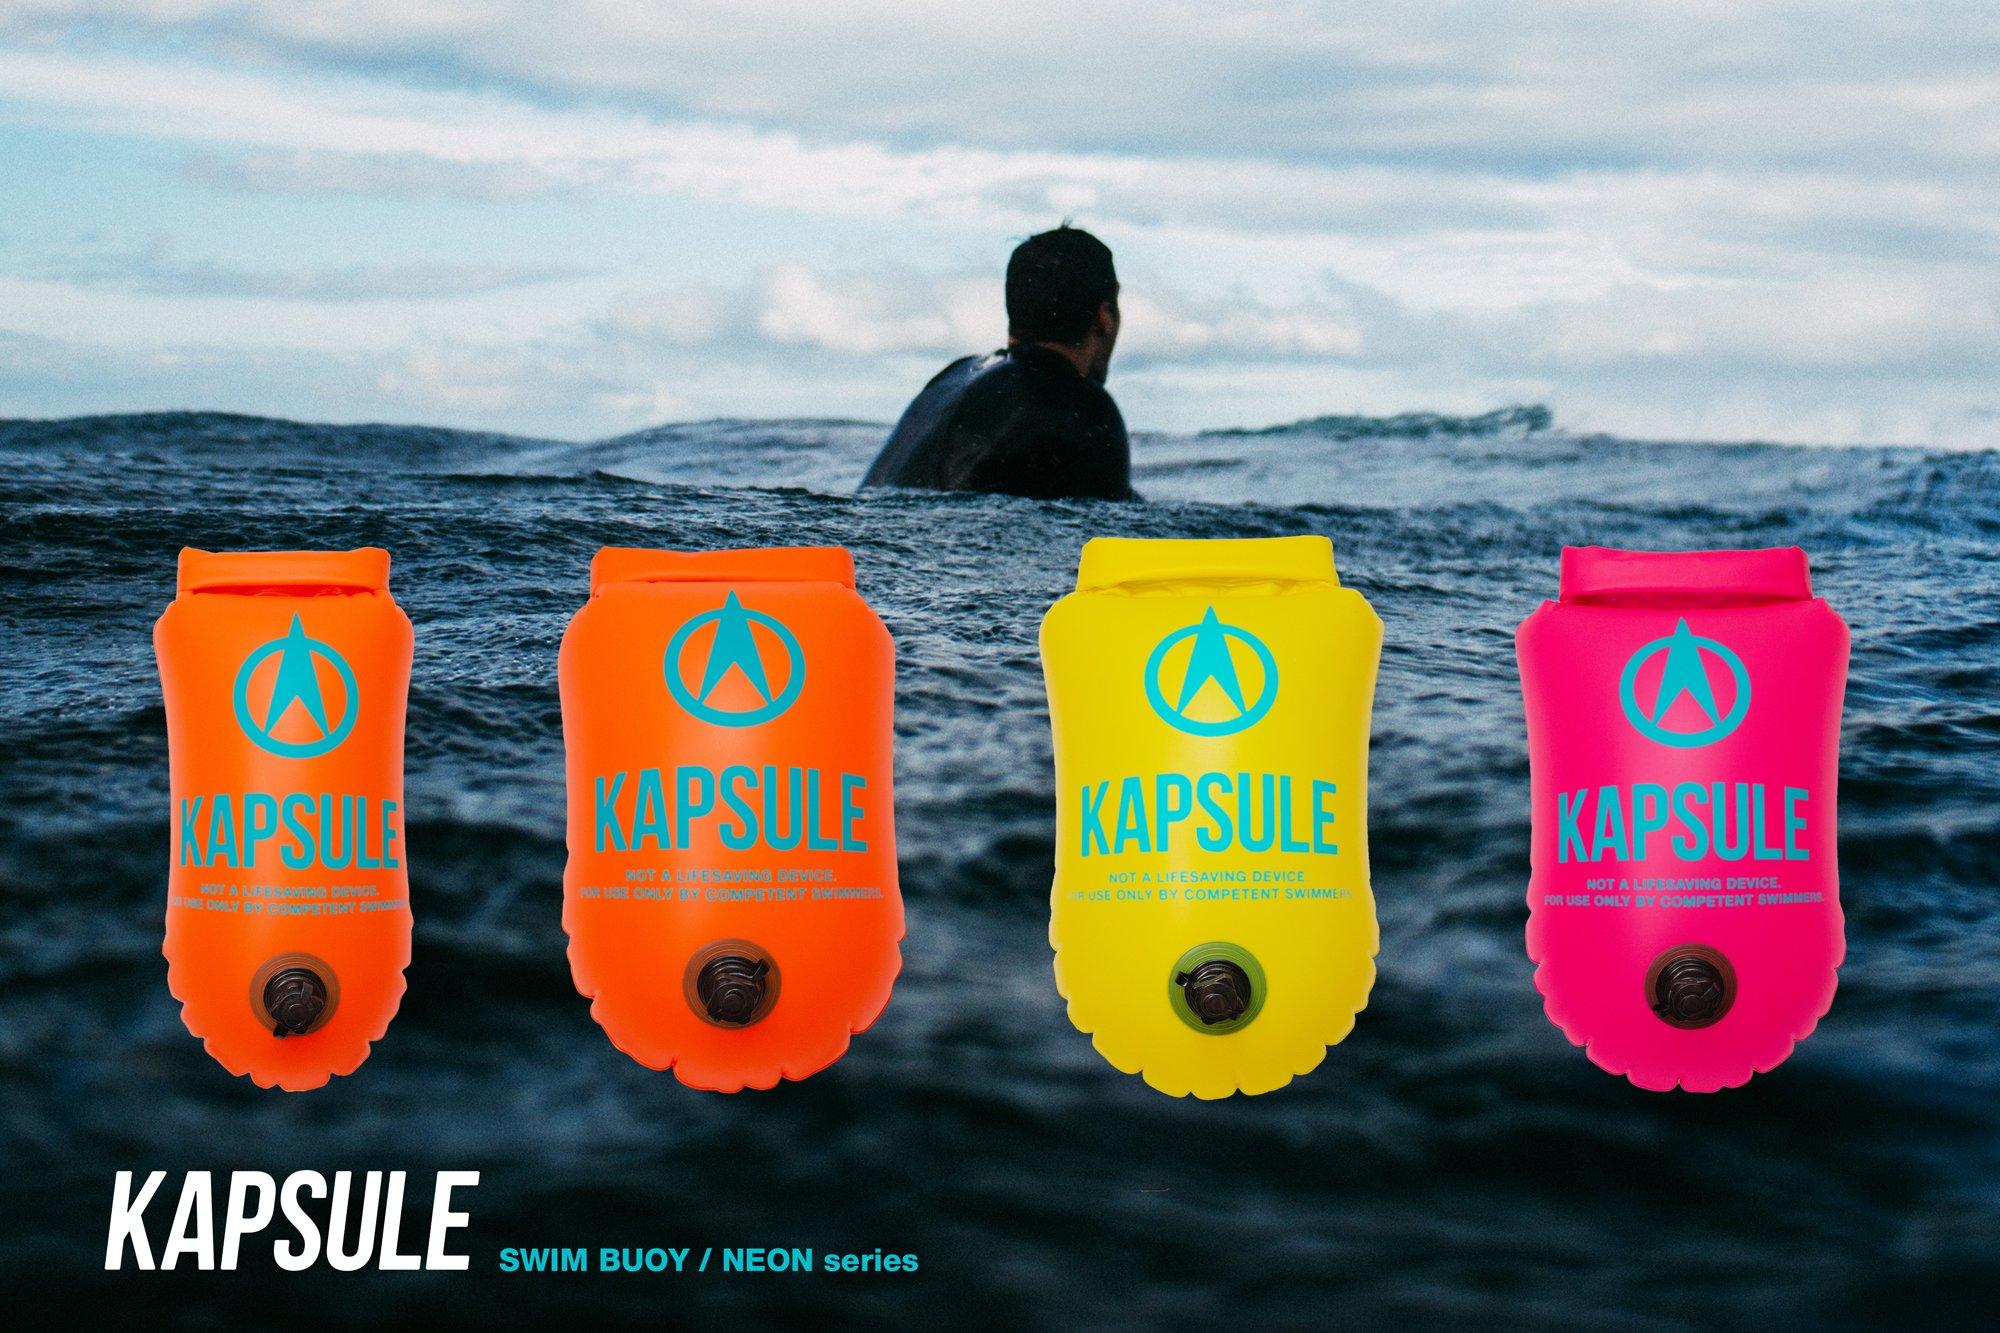 KAPSULE Swim Buoy (NEON 20L Orange) - Personal Swimming Float and Dry Bag by KAPSULE (Image #3)